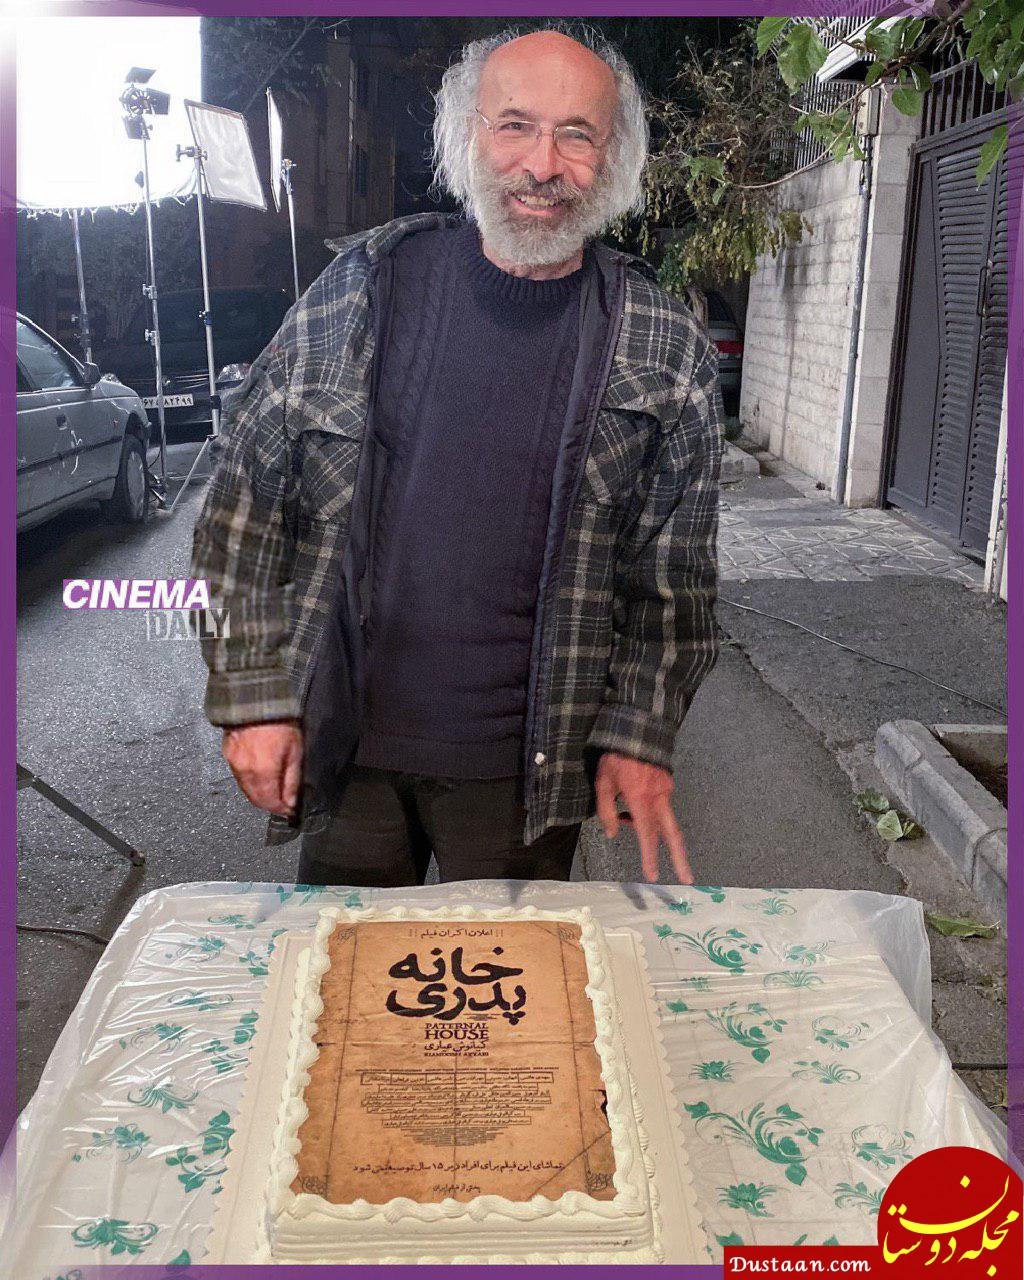 www.dustaan.com جشن کانون کارگردانان برای اکران مجدد «خانه پدری»